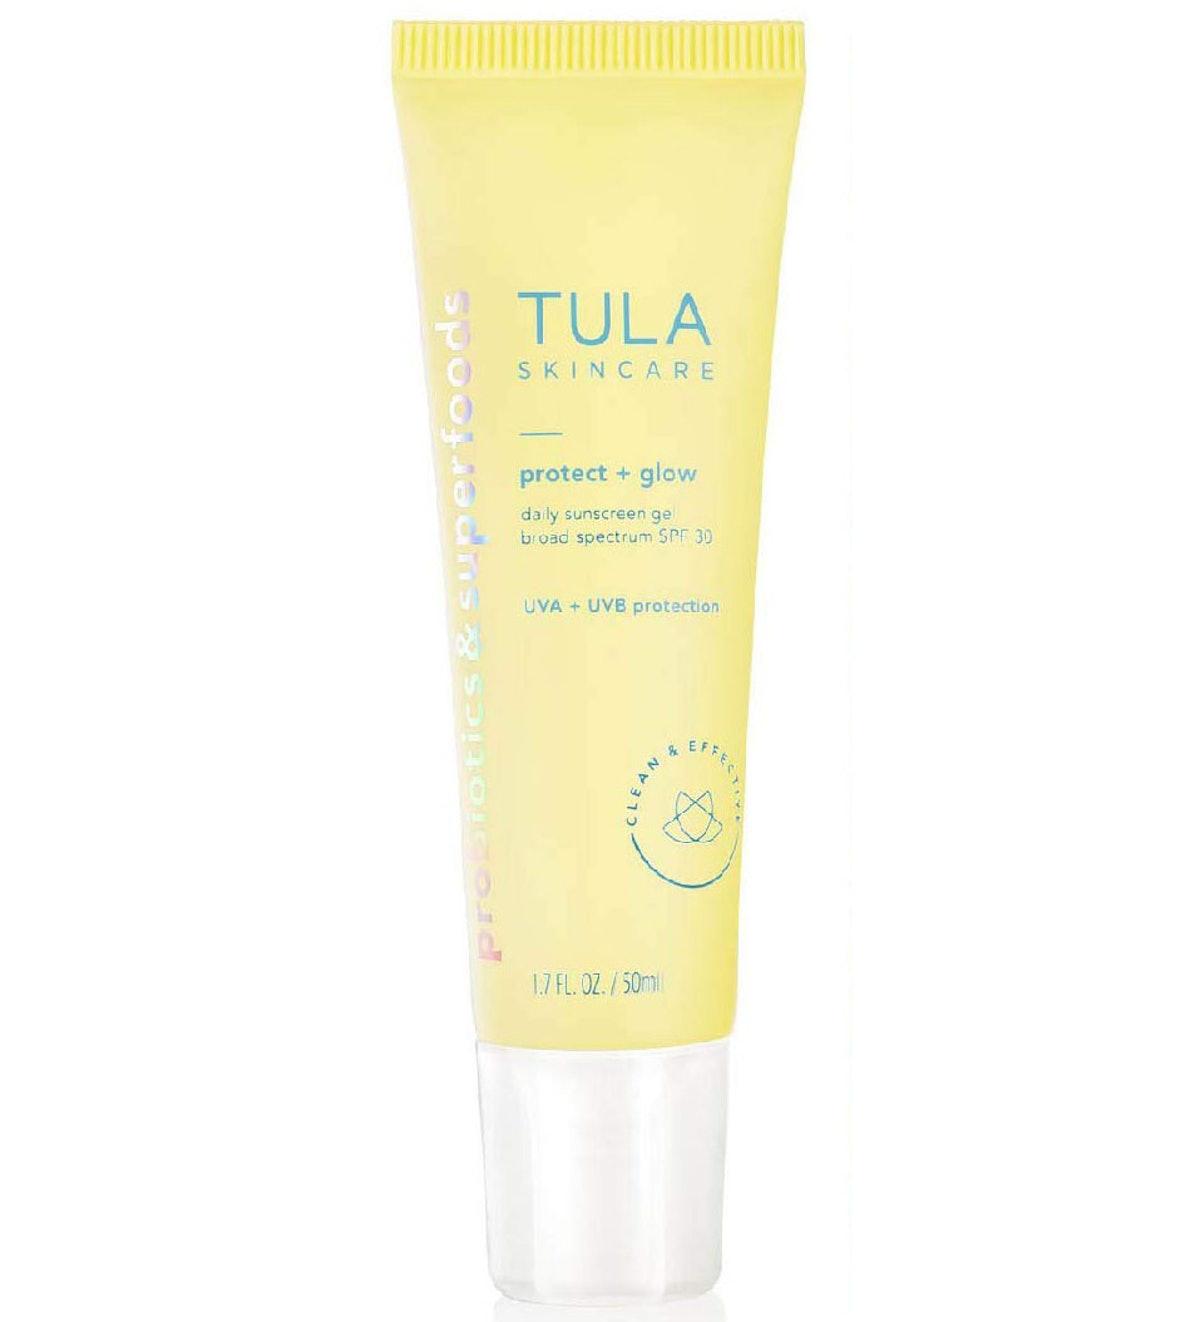 TULA Skin Care Protect + Glow Daily Sunscreen